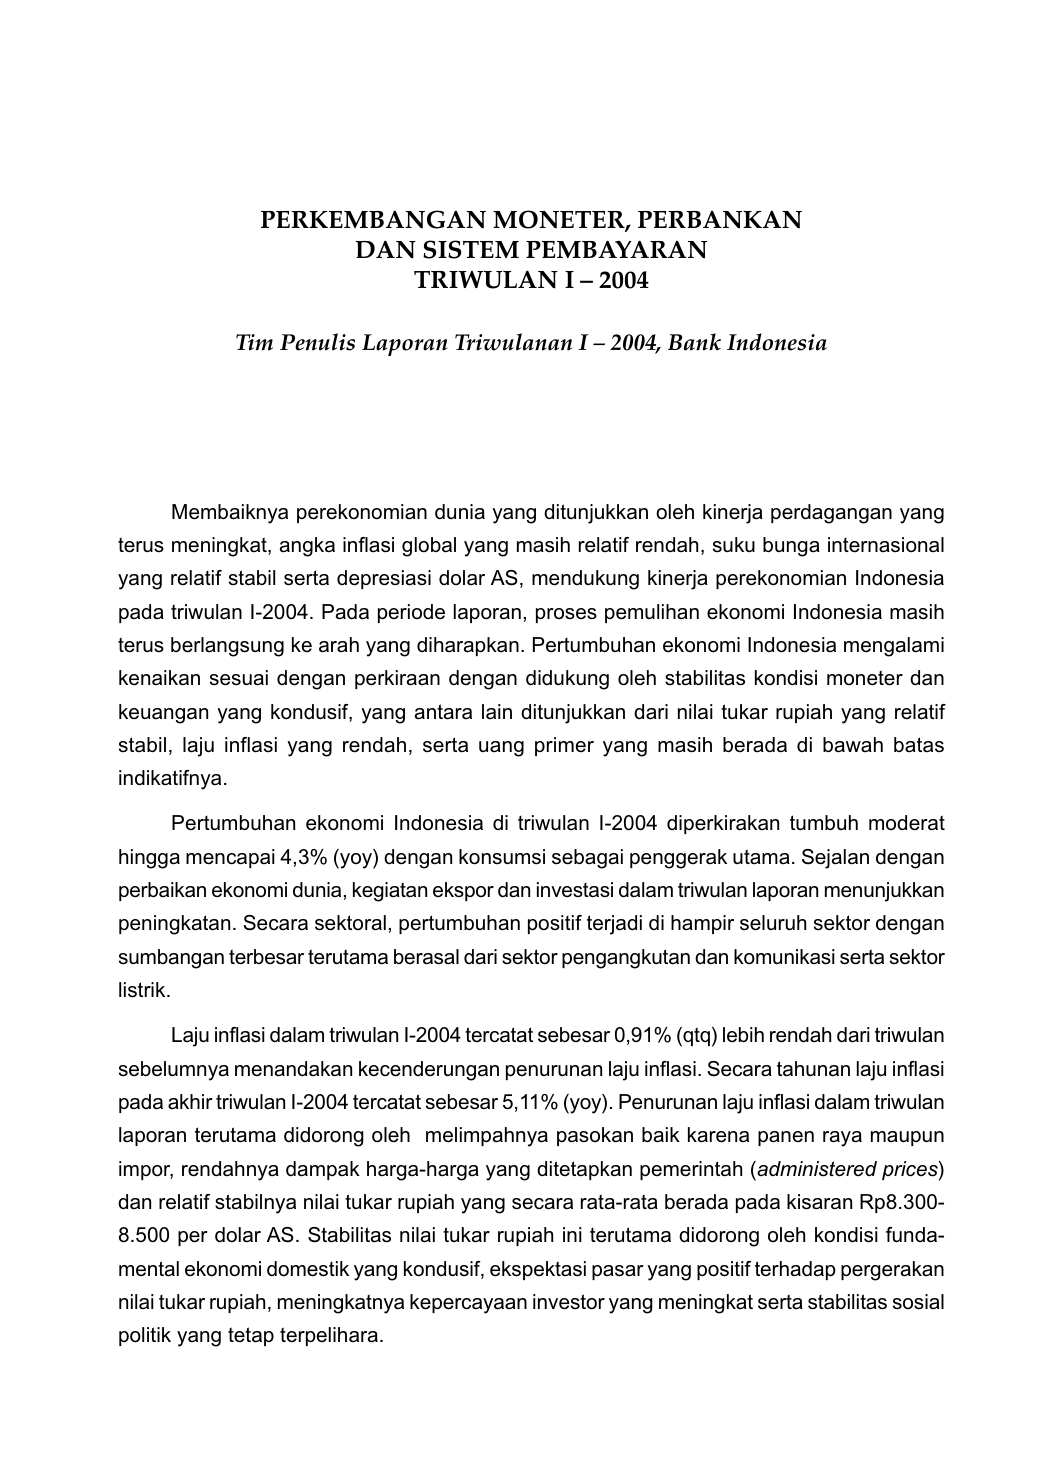 Laporan Perekonomian Indonesia Tahun 2004 Nawasis National Water And Sanitation Information Services